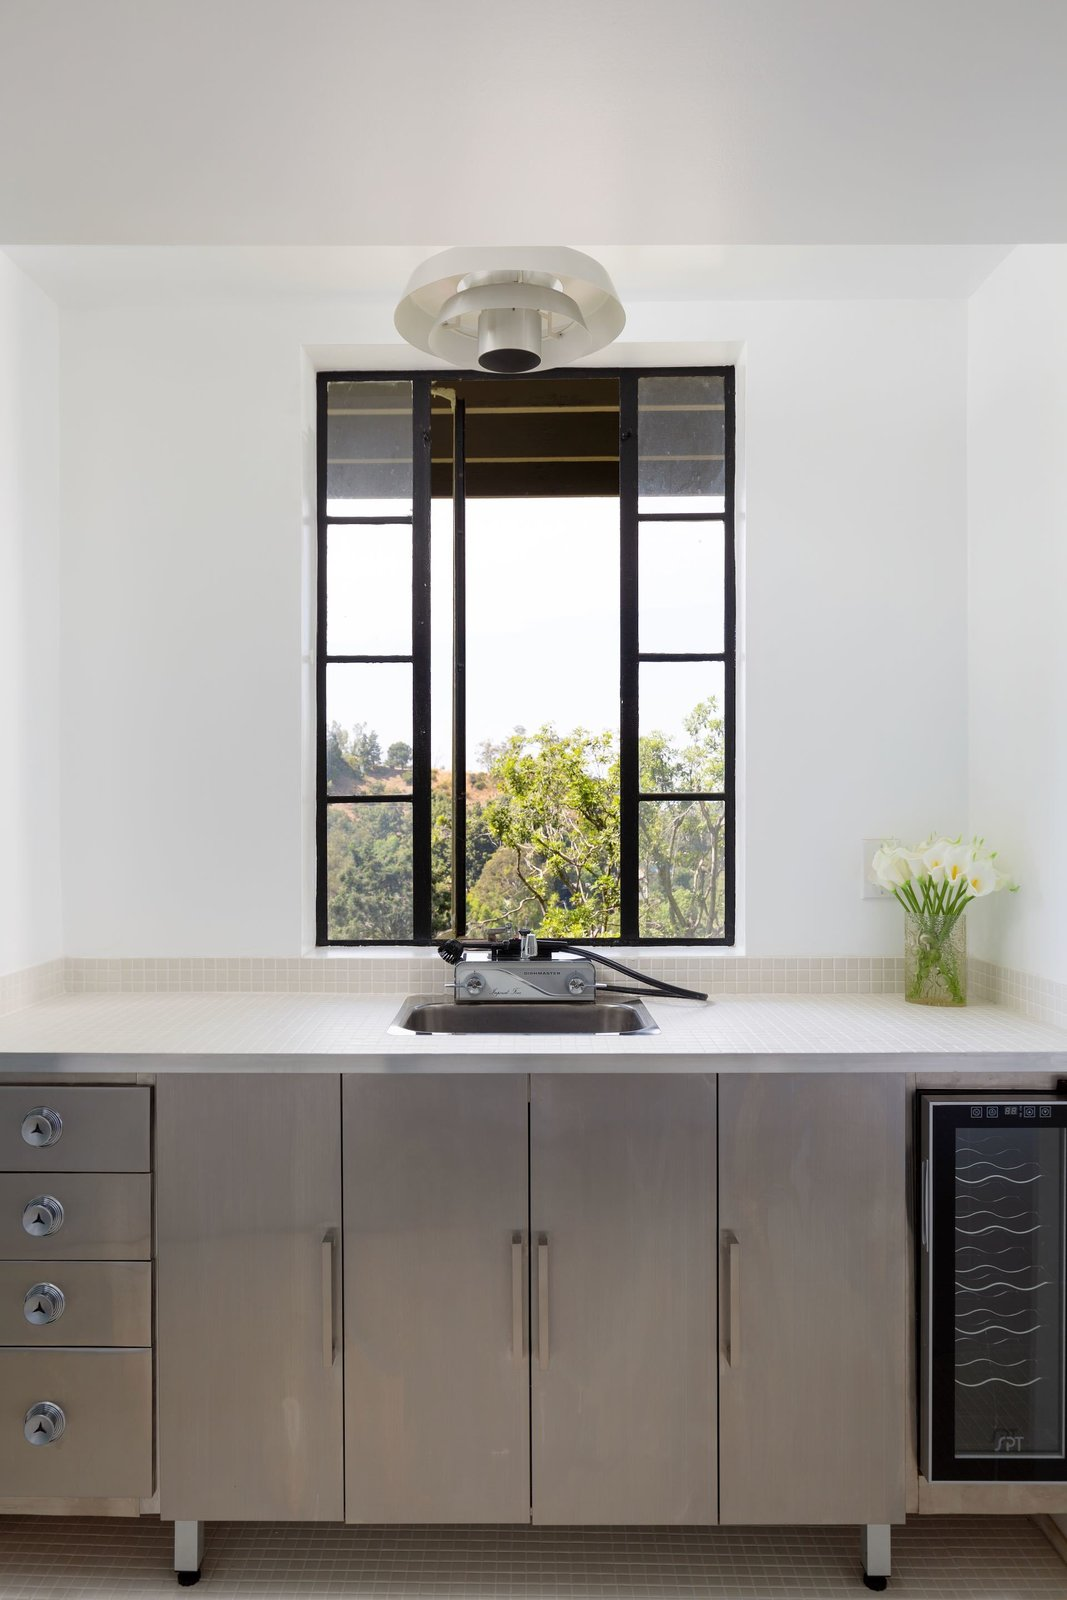 Laurel Canyon midcentury Los Angeles real estate kitchen